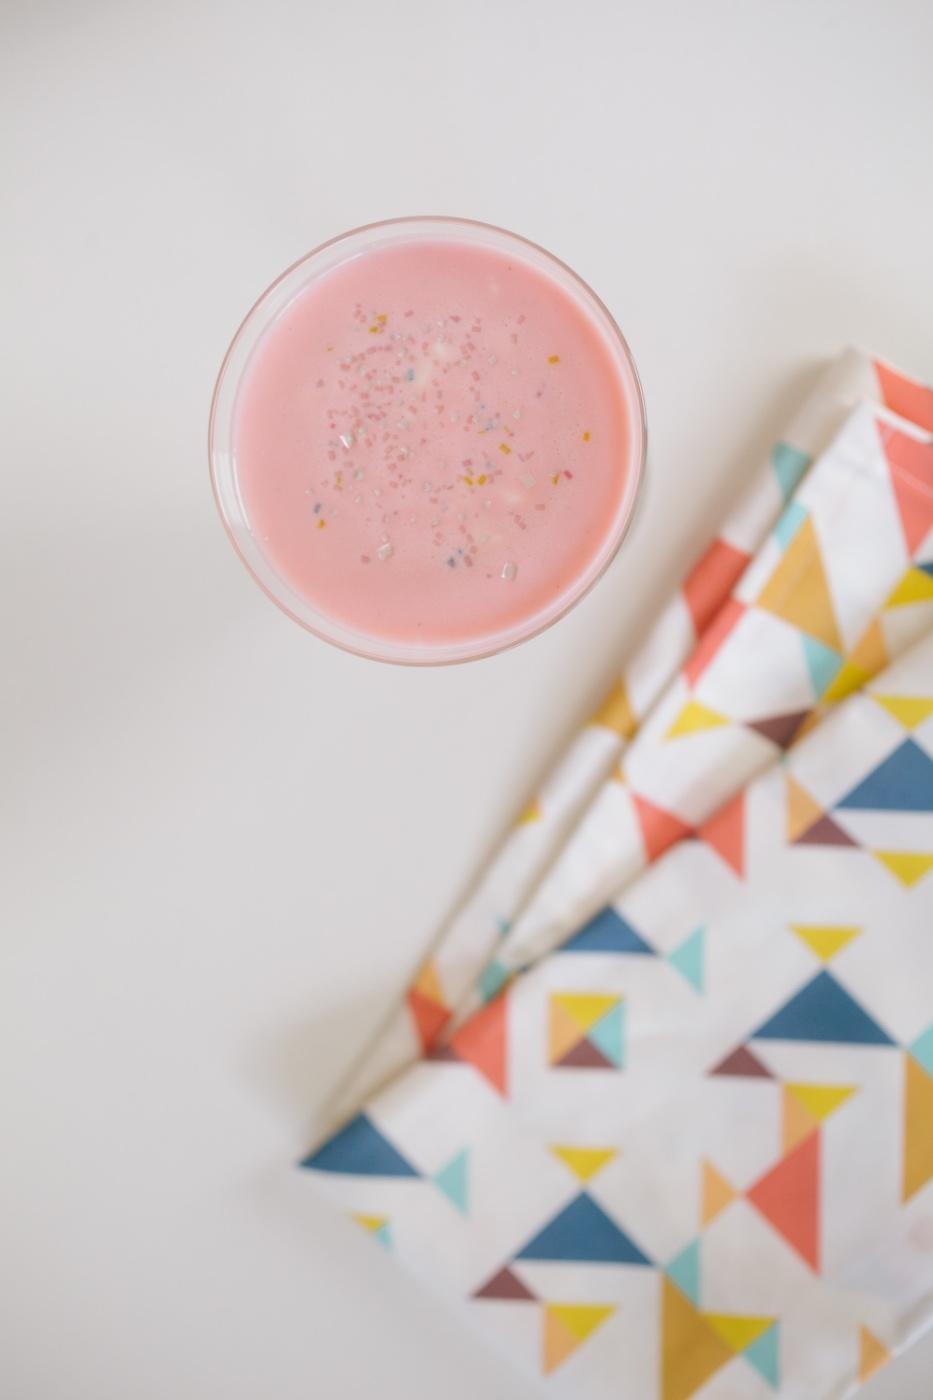 finished pink squirrel cocktail with frozen yogurt pop shop america